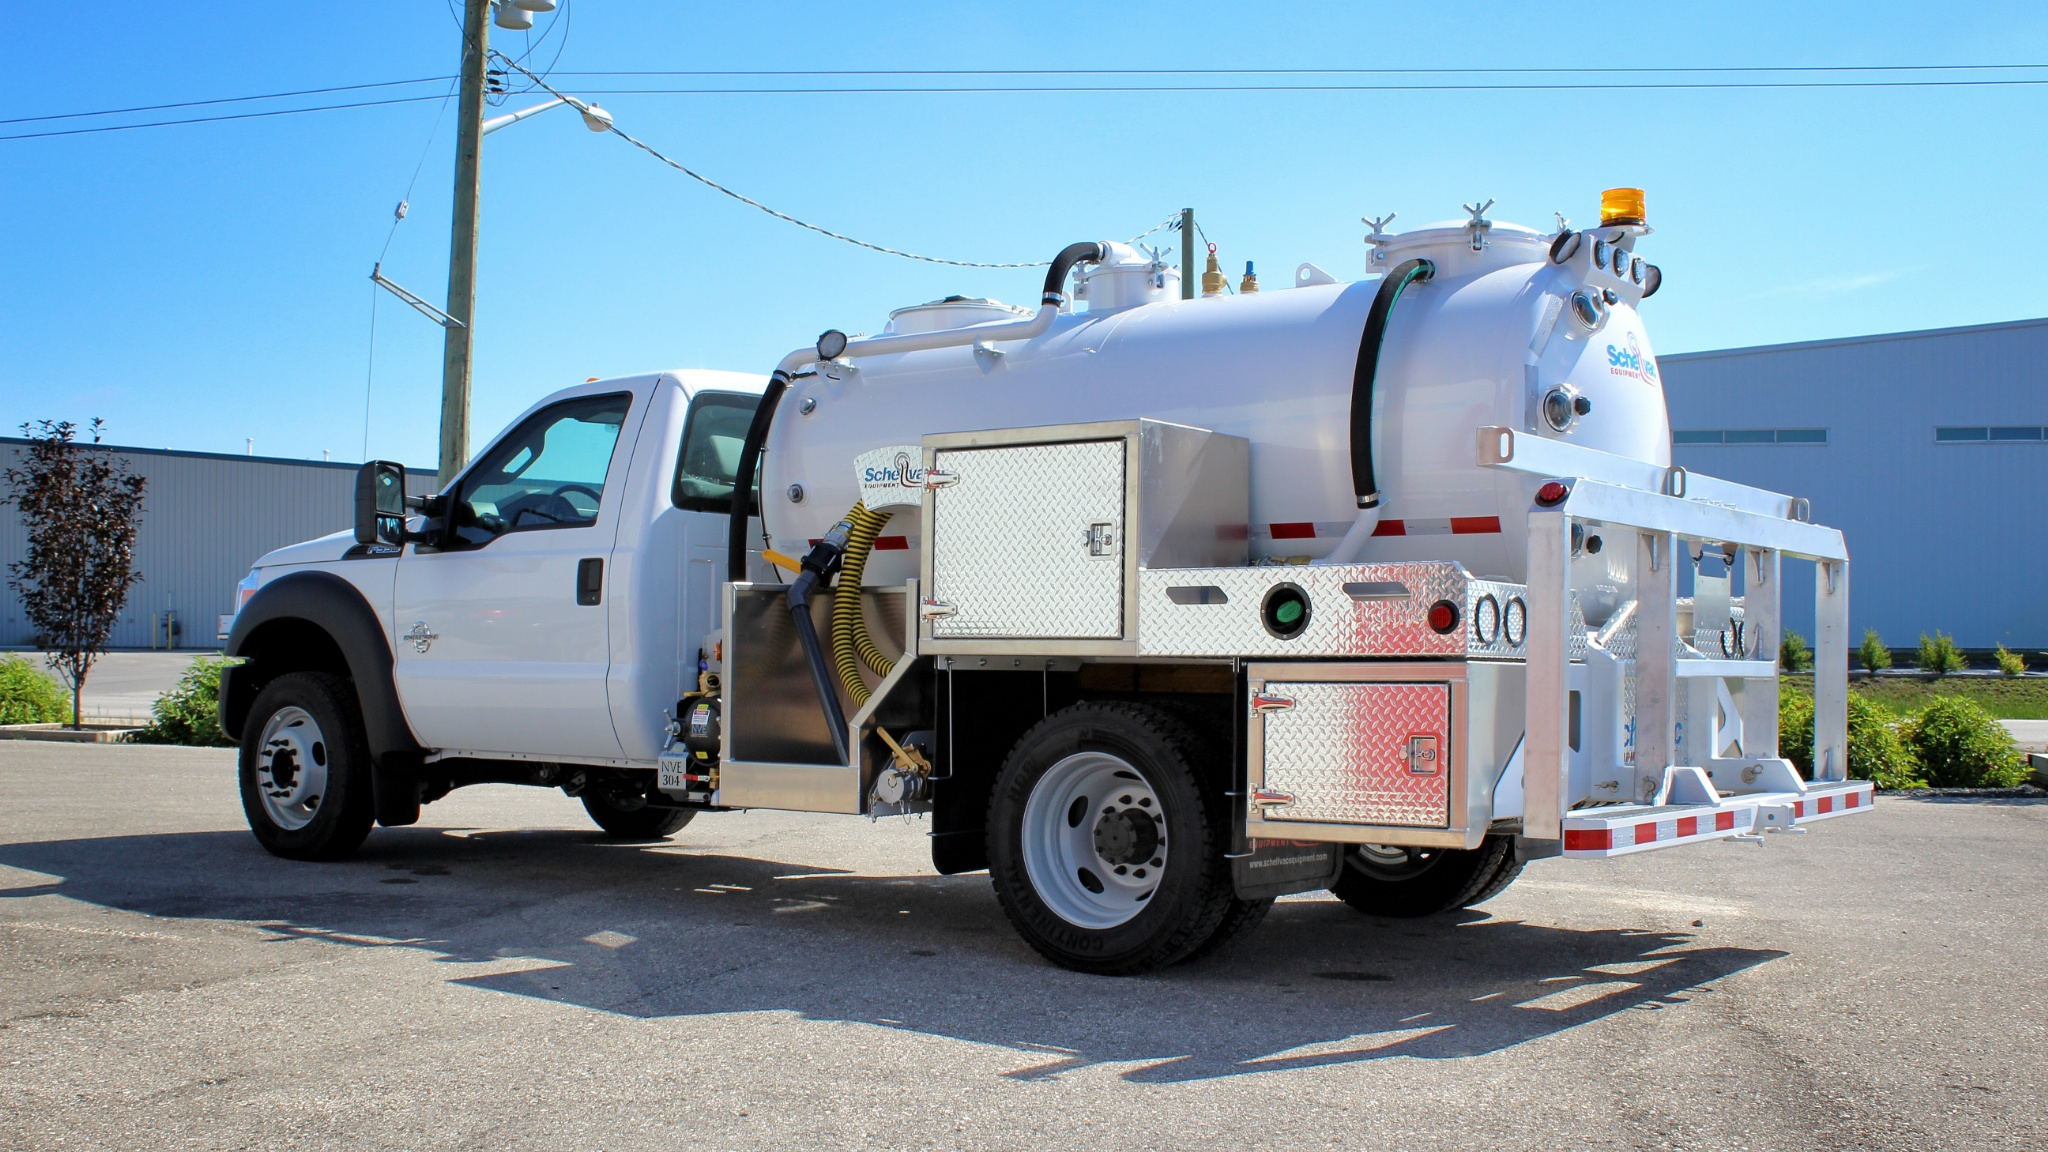 Portable Restroom, Portable Toilet, Vacuum Truck, Grease Truck, Grease Vacuum, Portapotty Vacuum, Portable Toilet Service Truck, Carwash Sludge Pumper